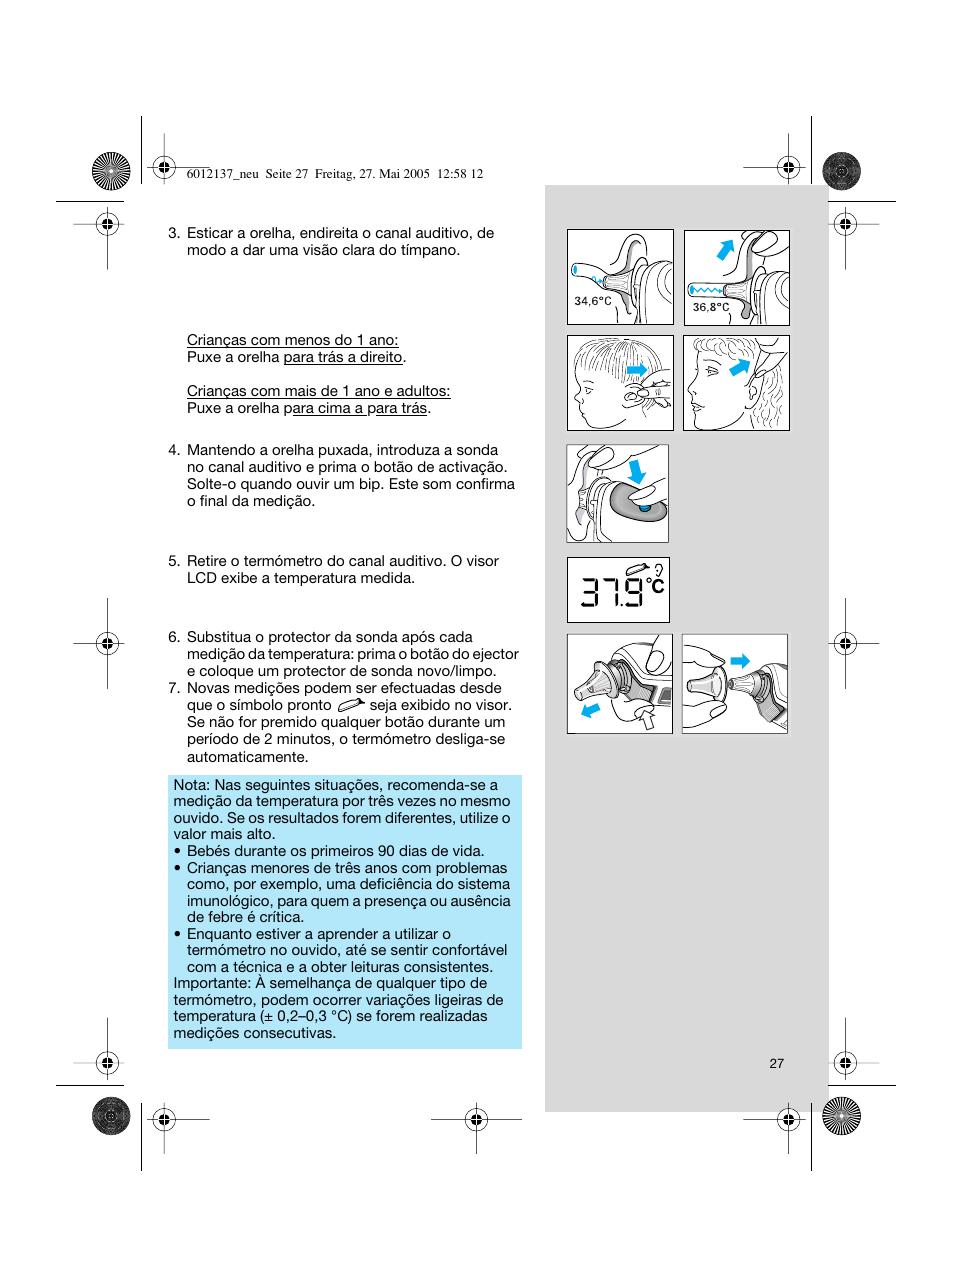 braun thermoscan irt 3020 user manual page 27 48 original mode rh manualsdir com Braun Thermometer Manual braun thermoscan irt 3020 mode d'emploi